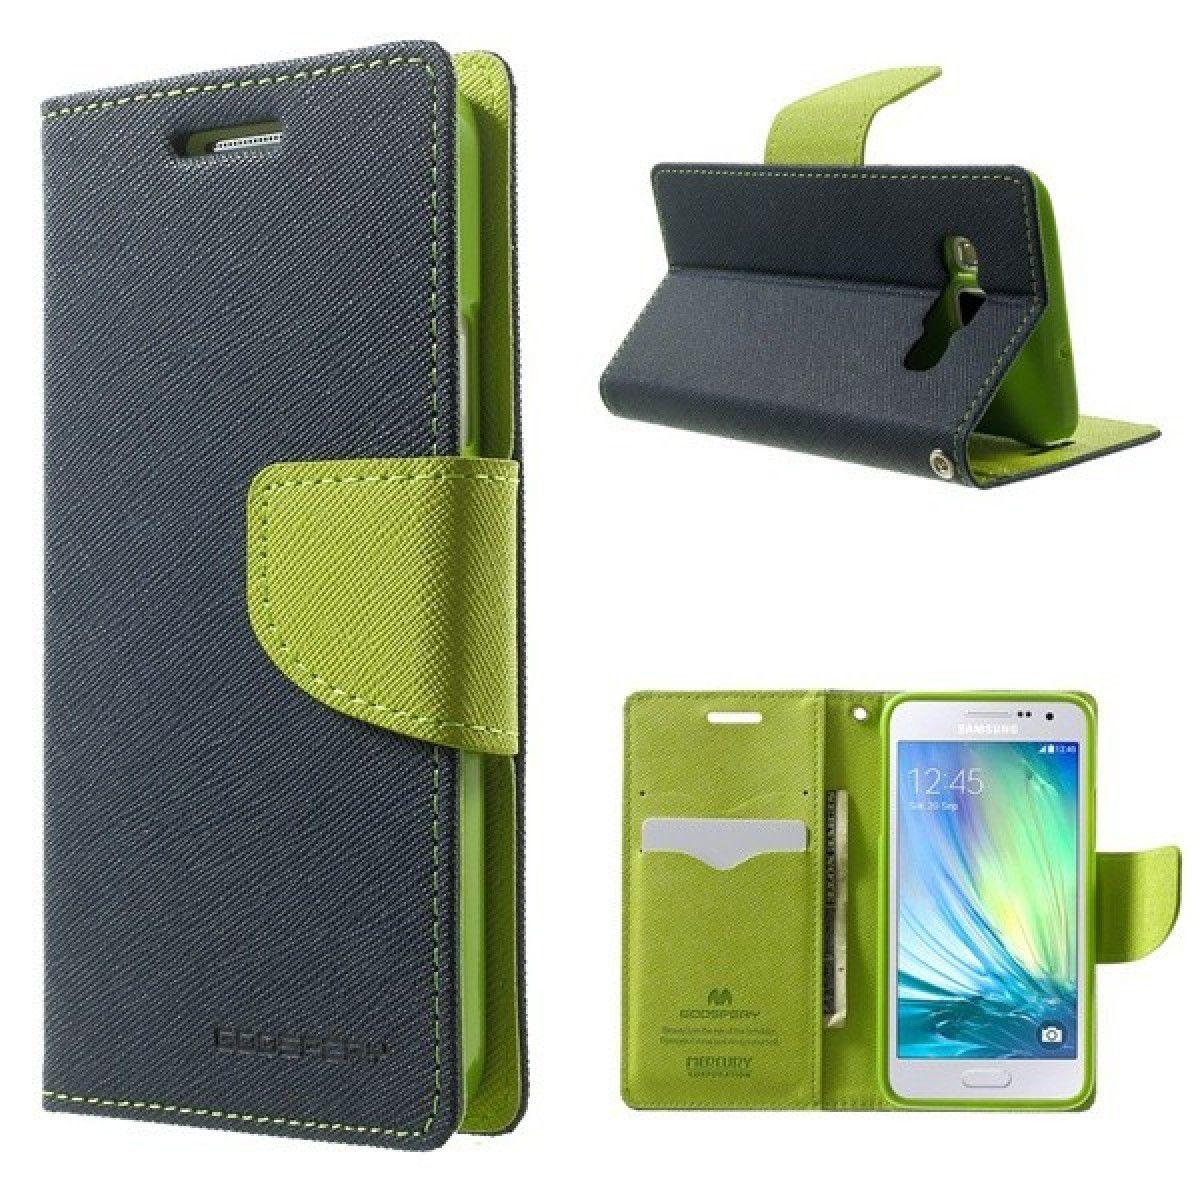 newest 26976 2e60a HTC Desire 816 Flip Cover by Mercury - Blue